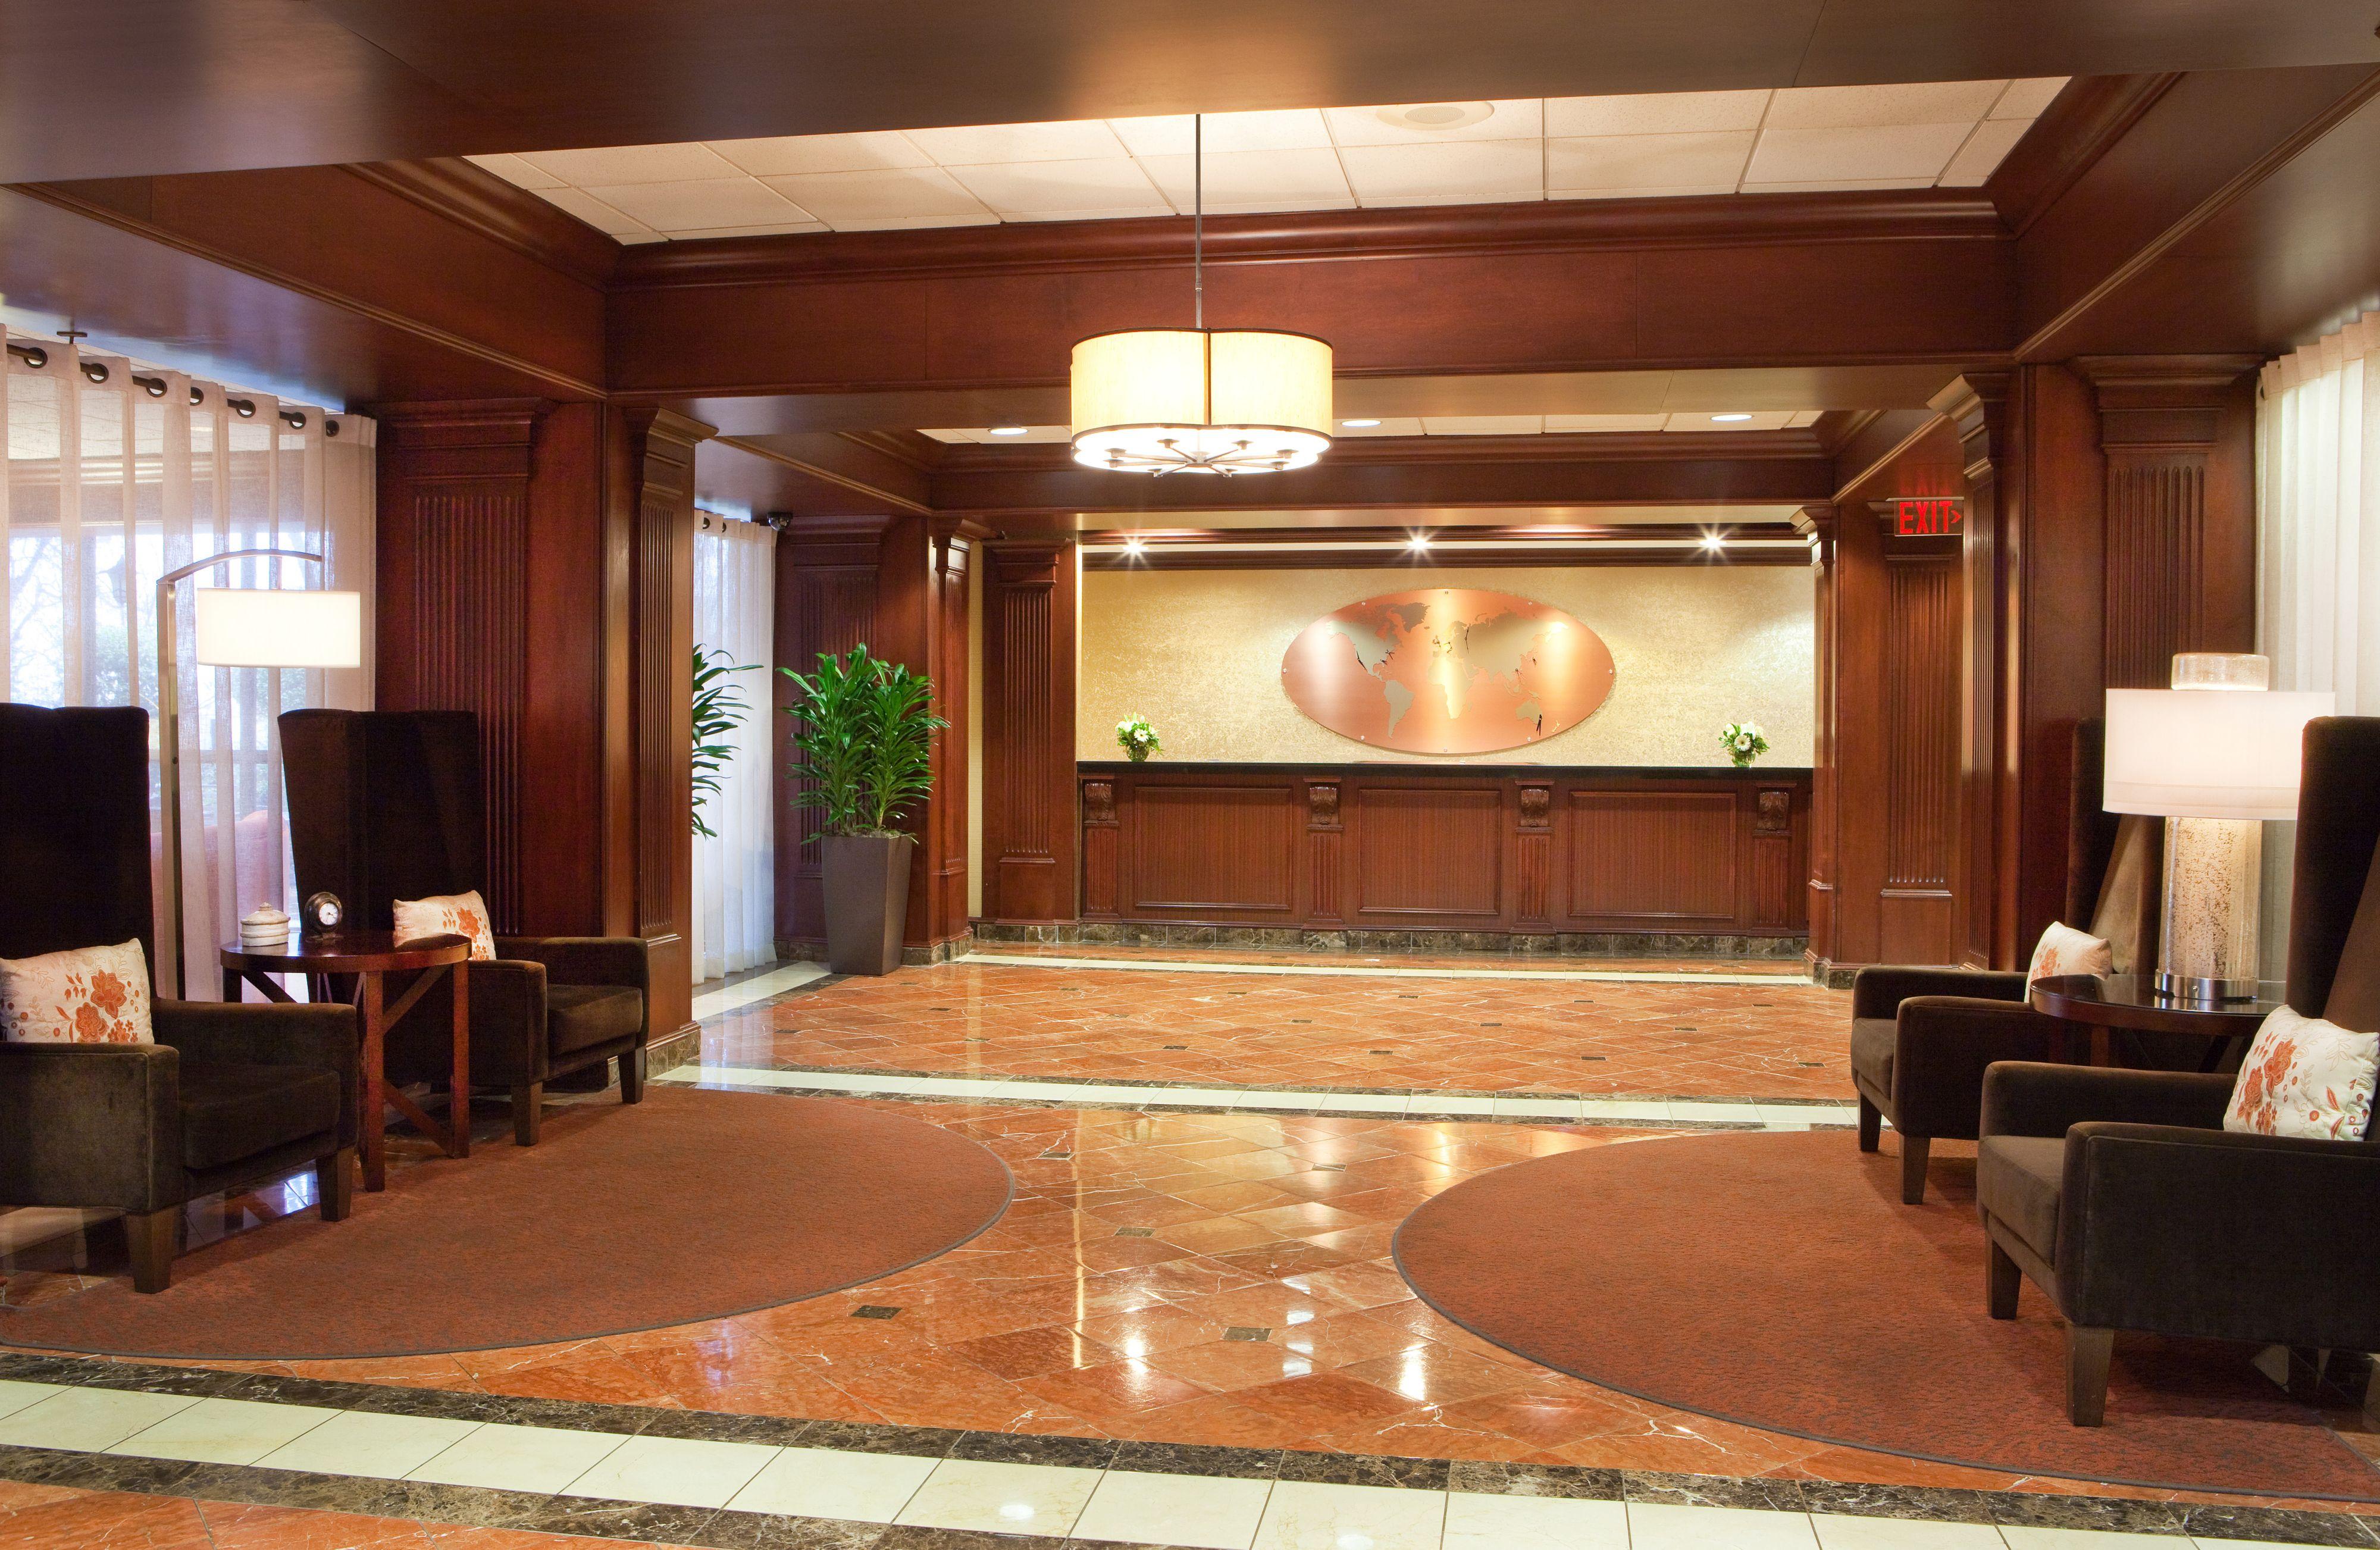 crowne plaza atlanta airport atlanta georgia ga. Black Bedroom Furniture Sets. Home Design Ideas